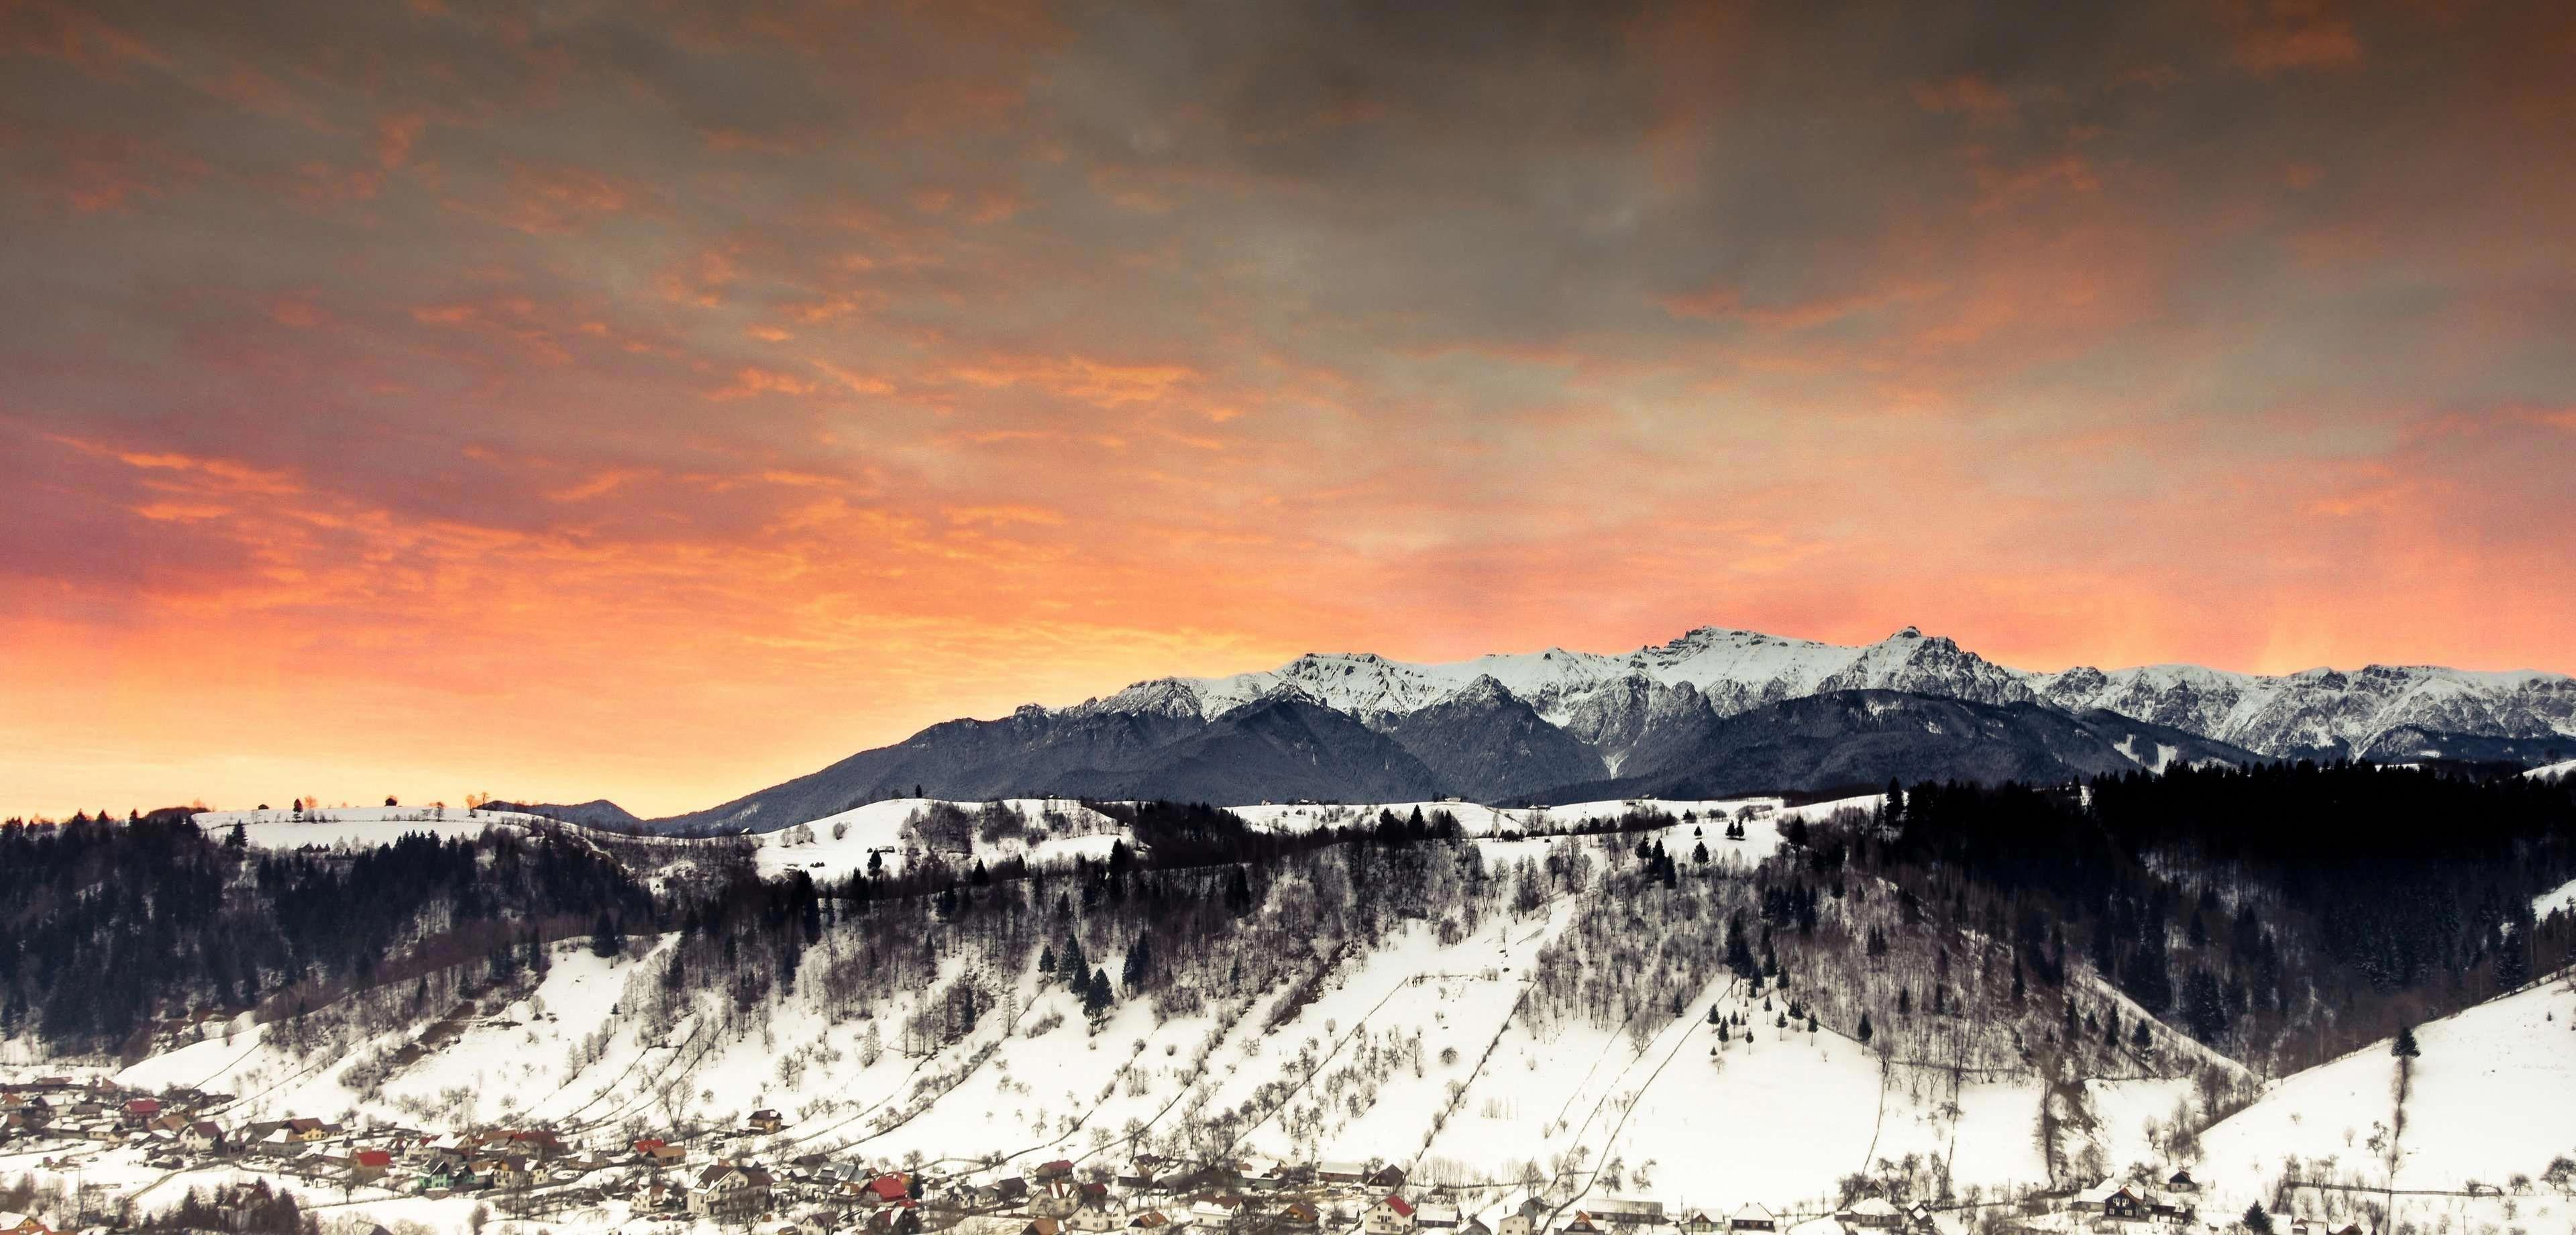 #adventure #climb #clouds #cold #dawn #grass #high #hike #hills #ice #landscape #mountain peak #mountain range #mountains #nature #outdoors #resort #scenic #ski resort #snow #summer #sunset #travel #trees #winter #woods